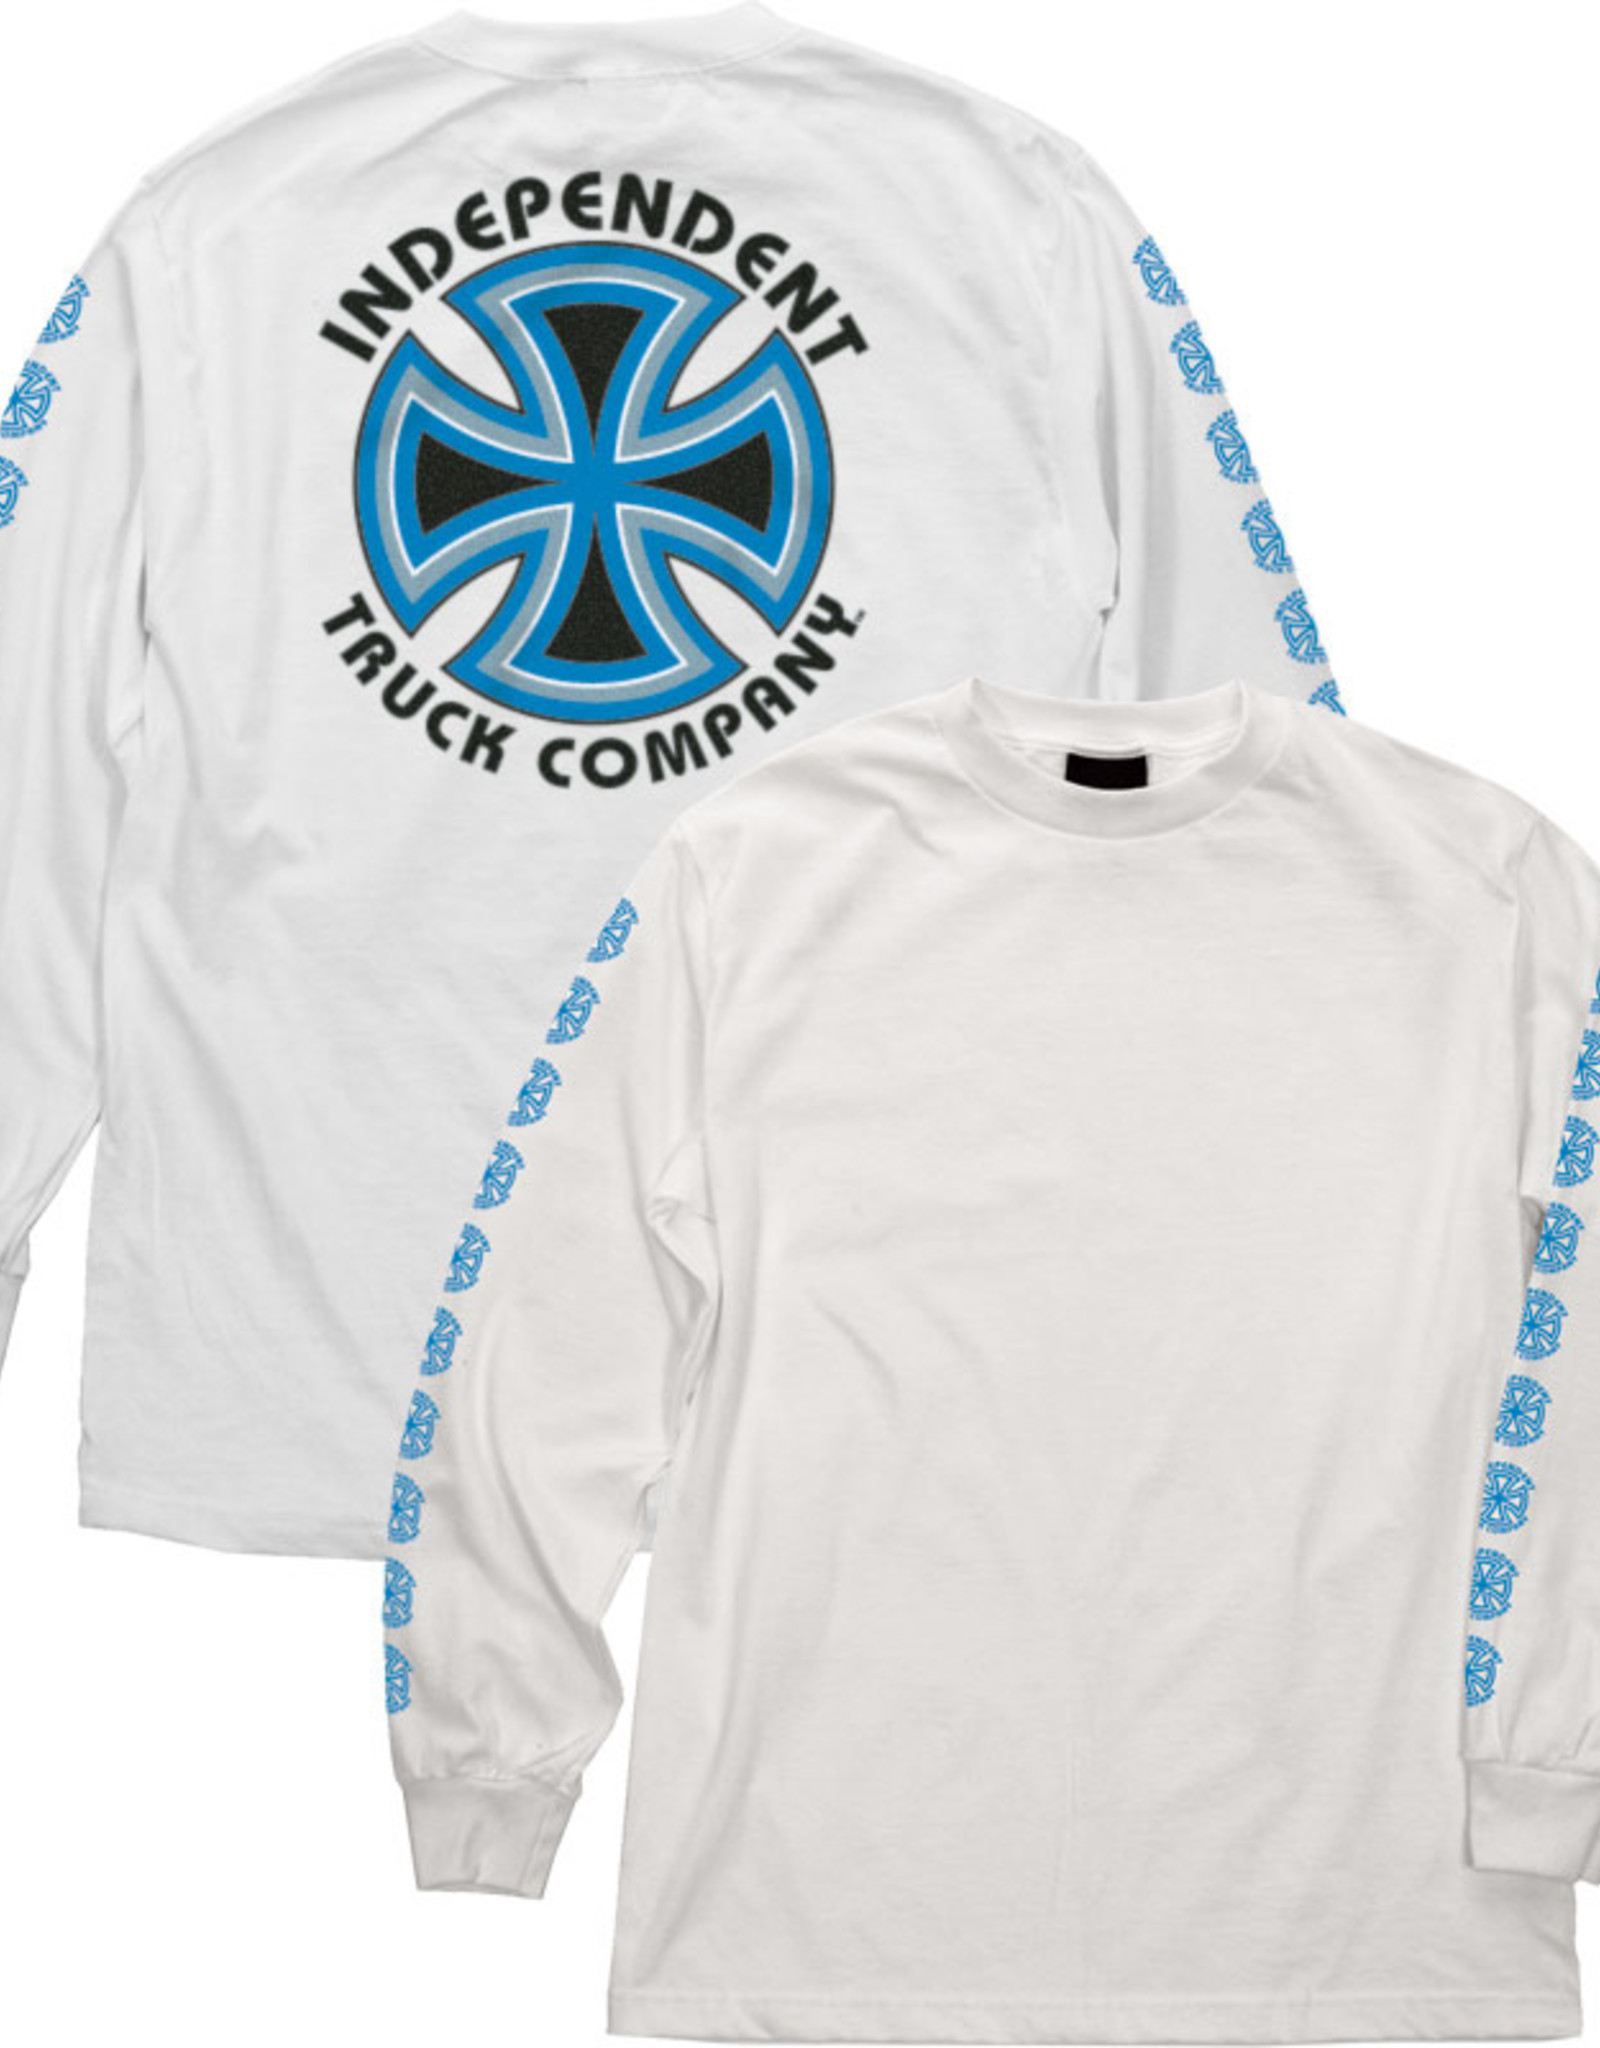 Independent Indy L/S T-shirt Bauhaus Cross White